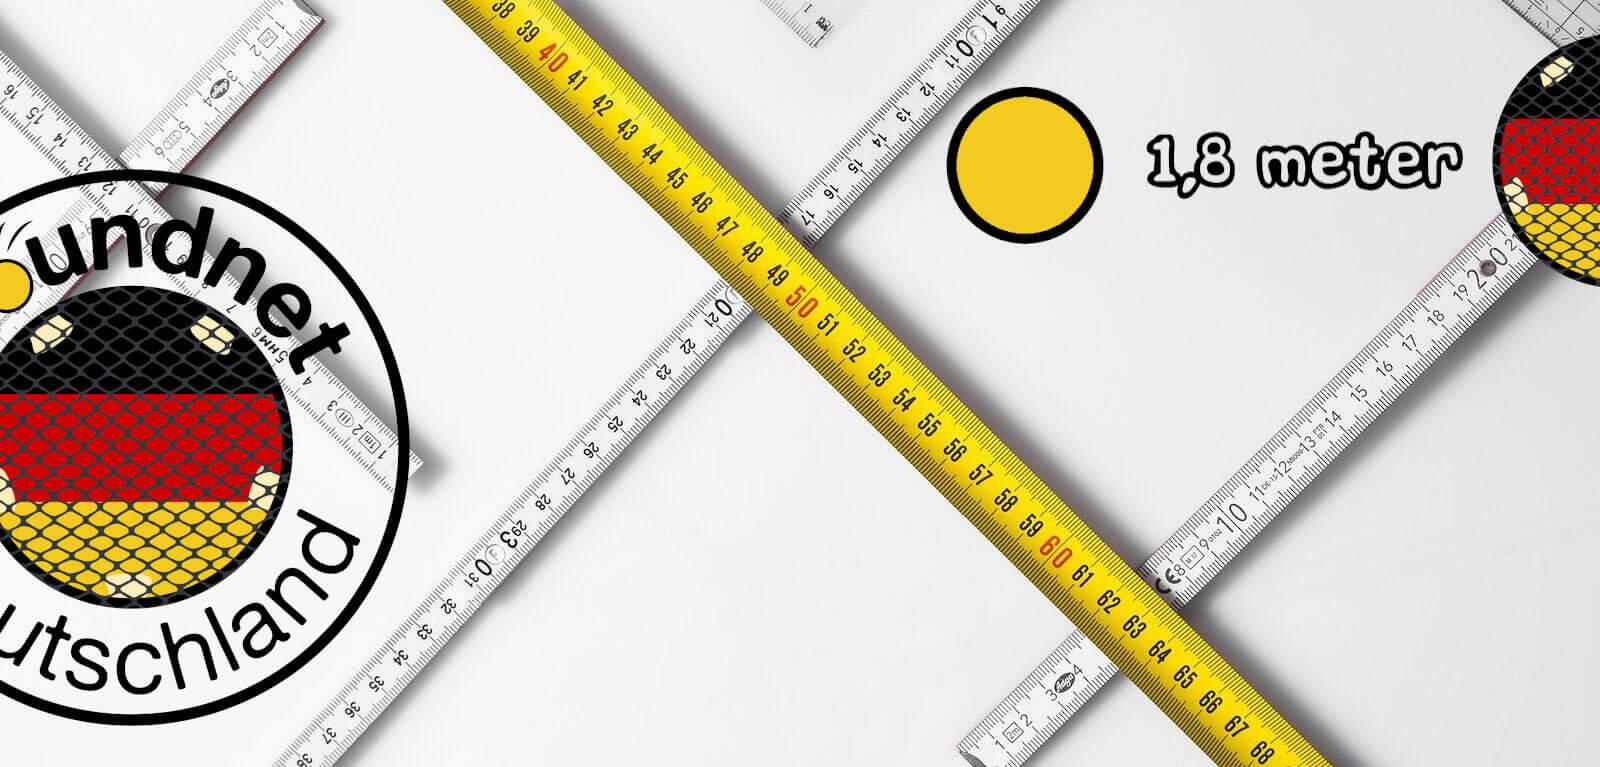 Abstand zum Netz beim Aufschlag – offzielle Spikeball™ Regeln